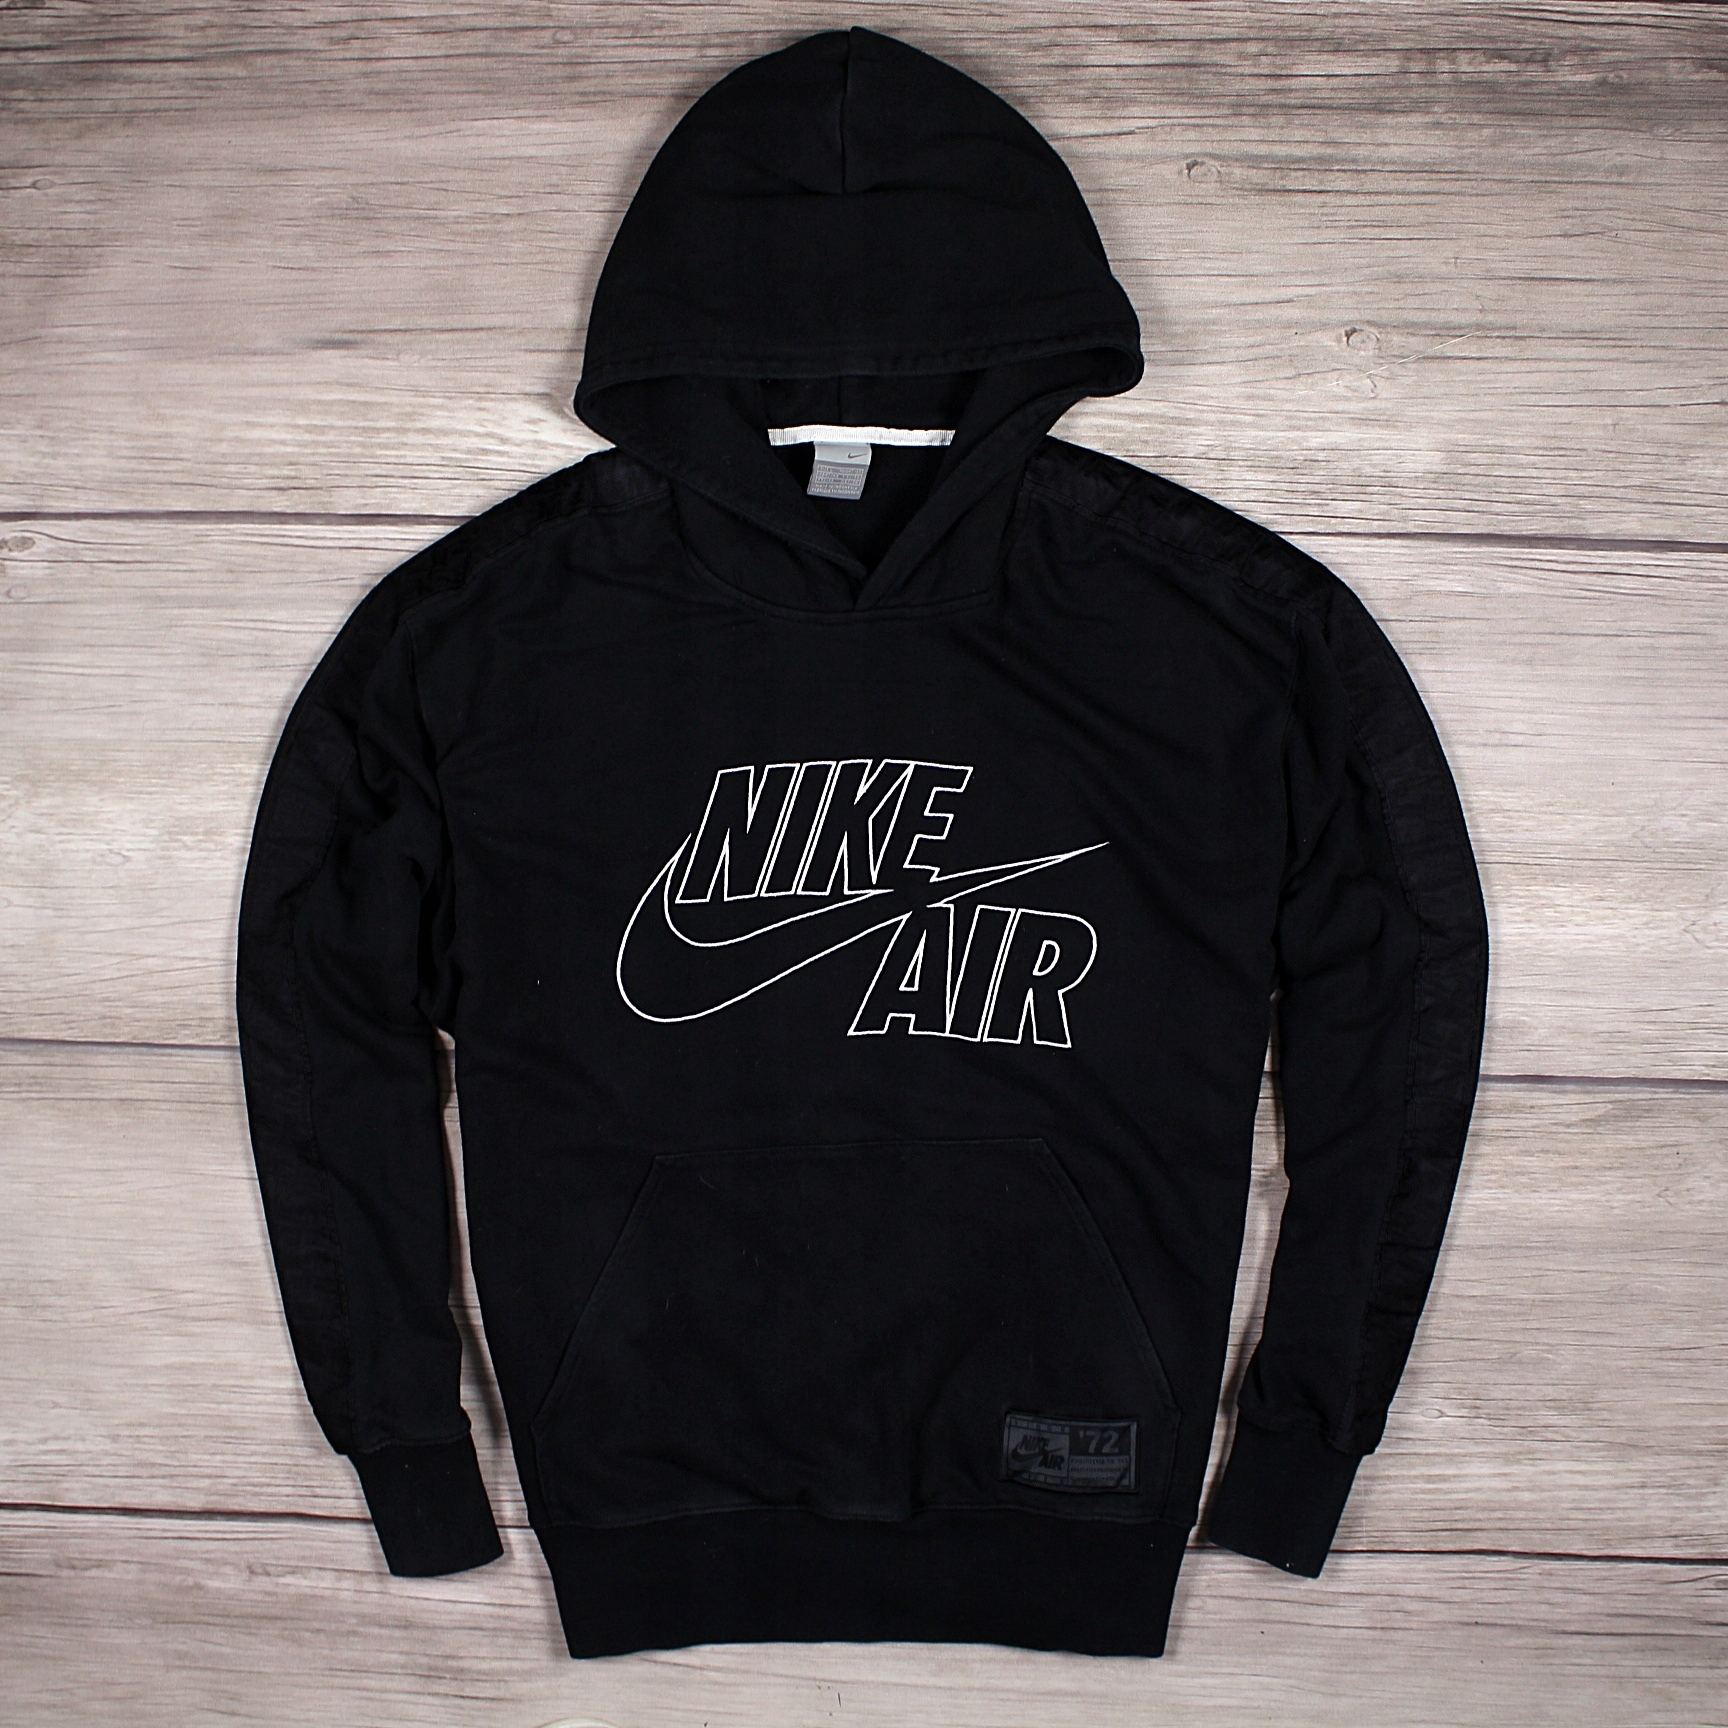 bardzo tanie najtańszy bliżej na NIKE AIR MAX 72 Bluza Męska Logowana Big Logo _ L